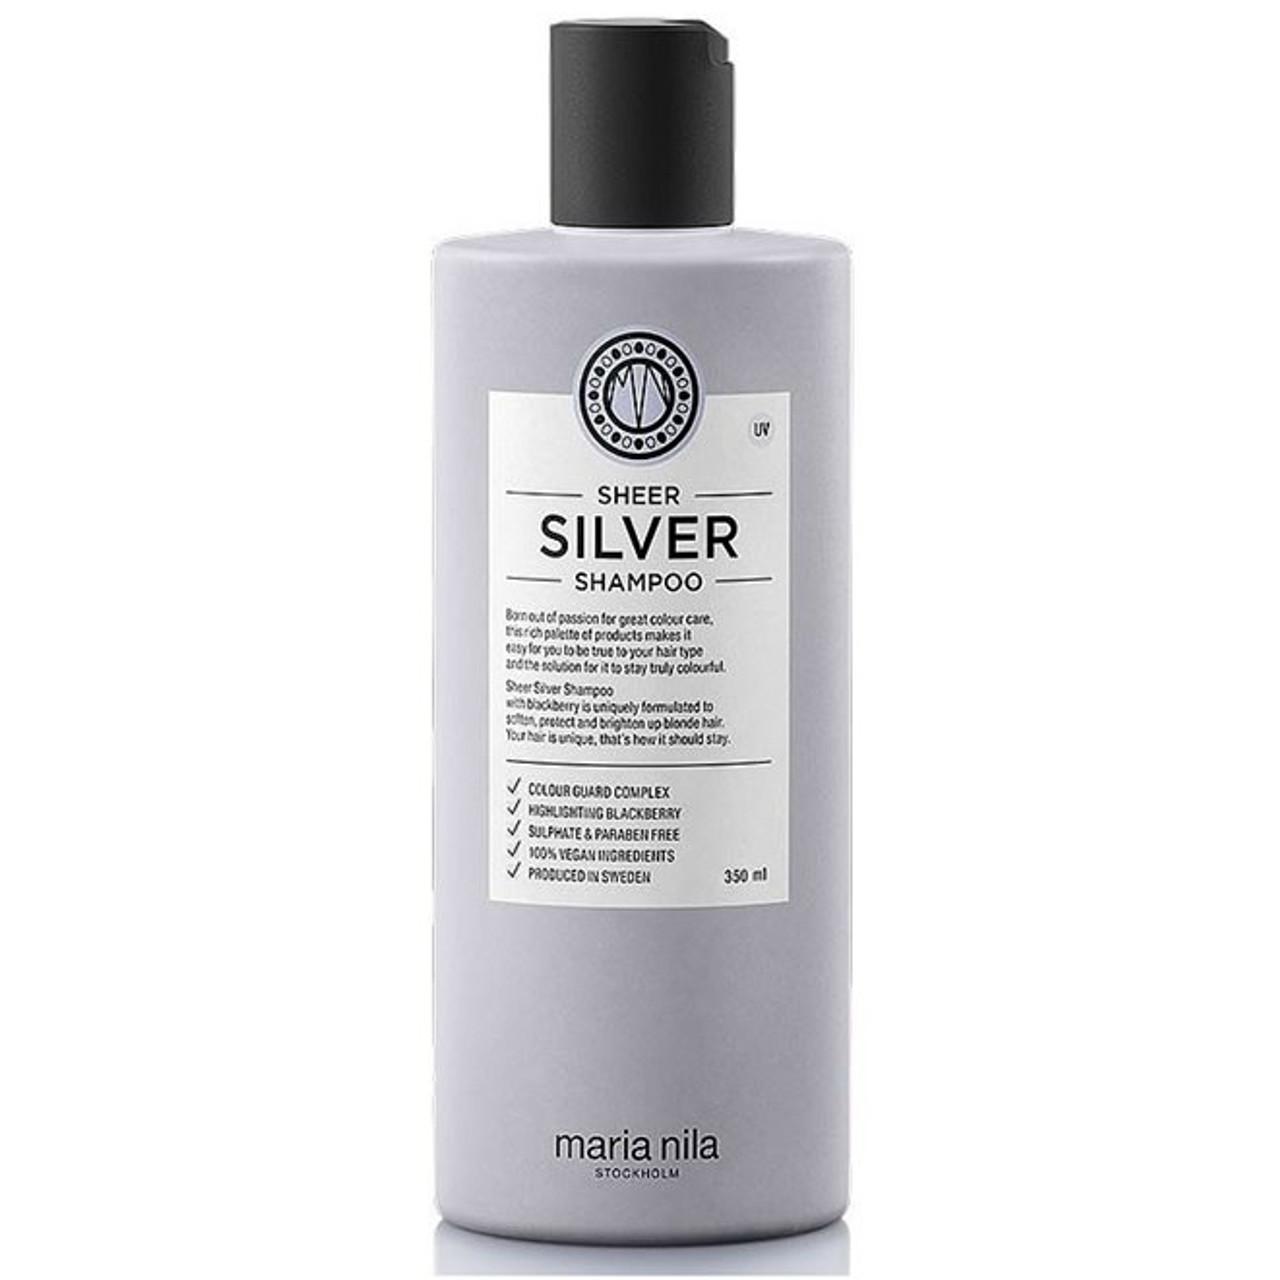 Maria Nila Sheer Silver Shampoo 11.8 oz